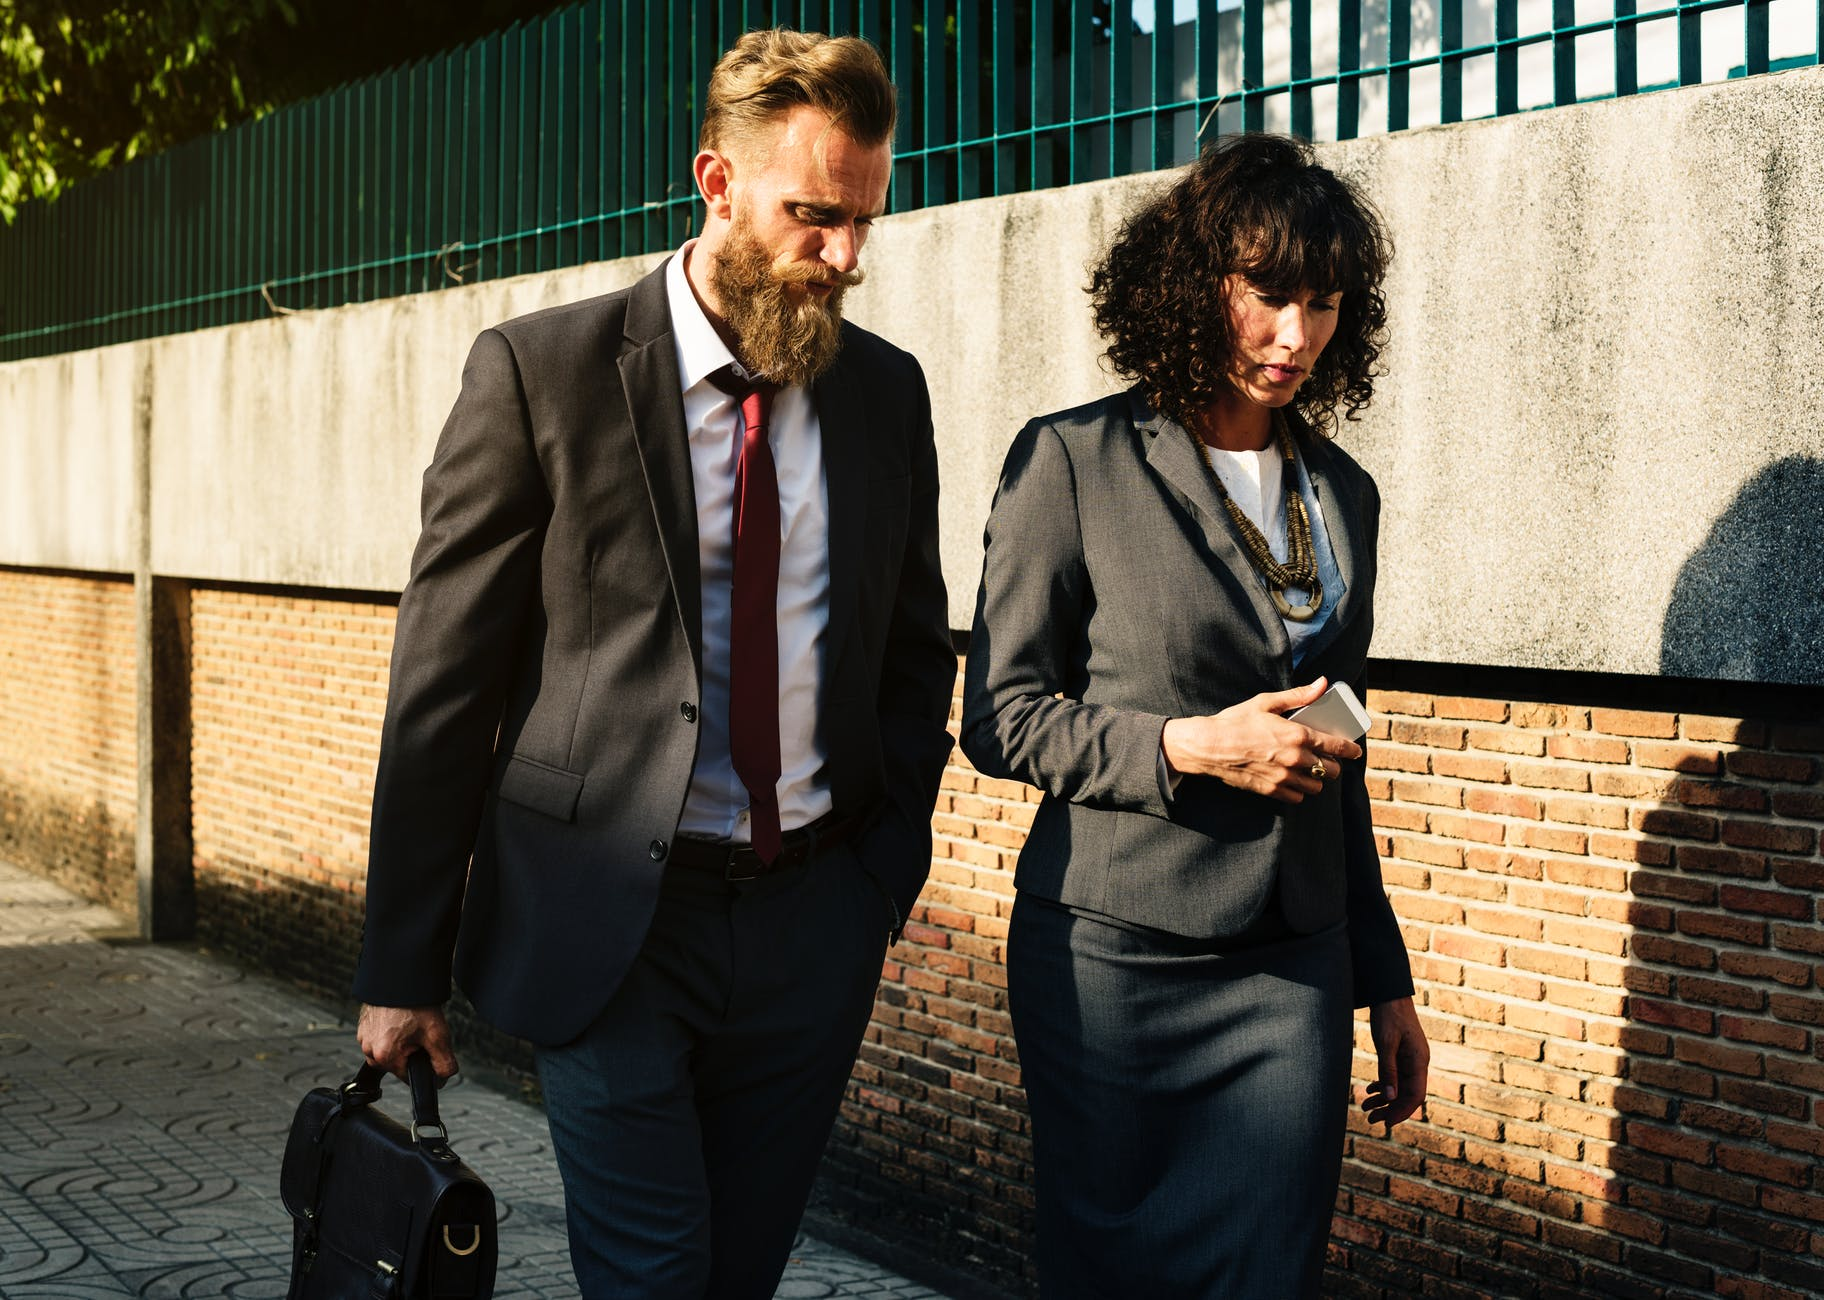 adult beard business city